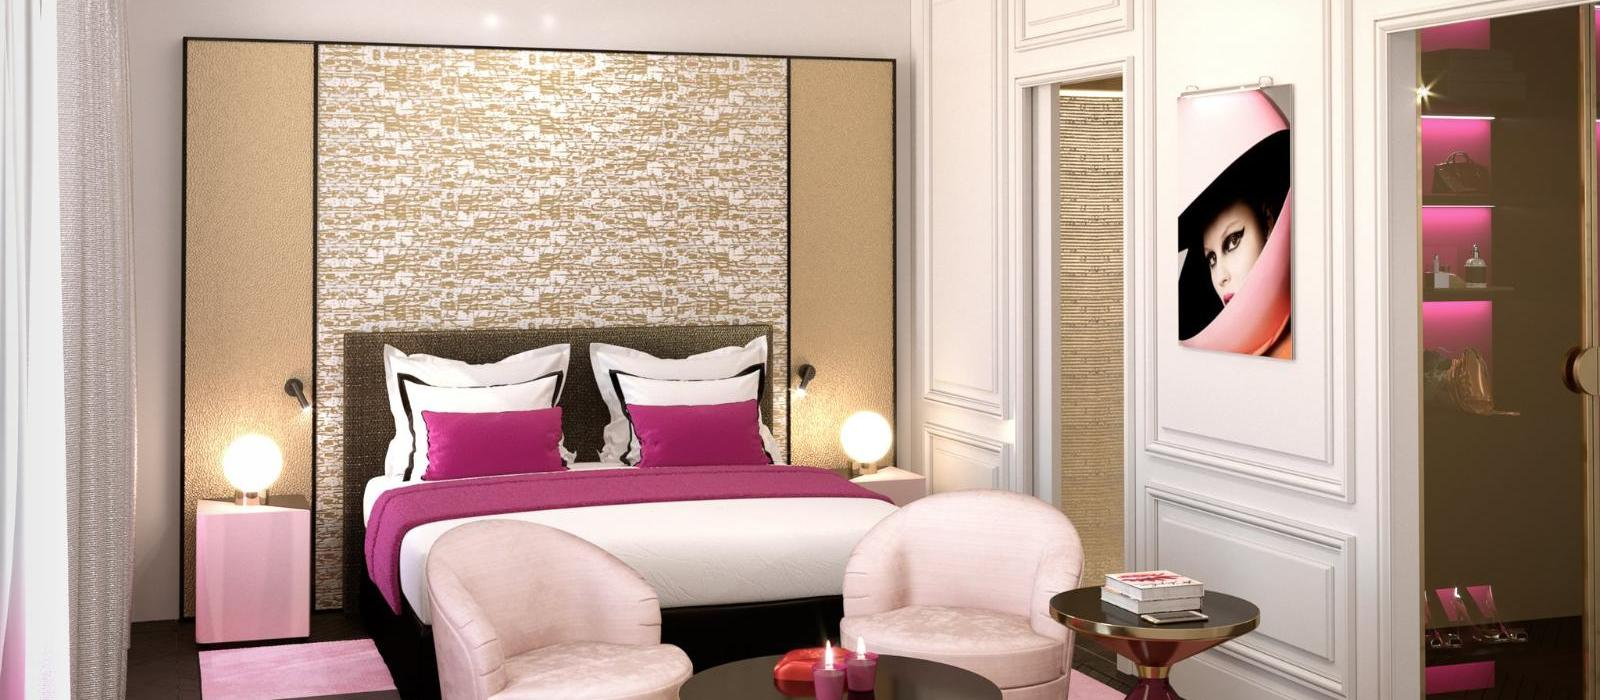 馥颂酒店(Fauchon L Hotel Paris) 图片  www.lhw.cn